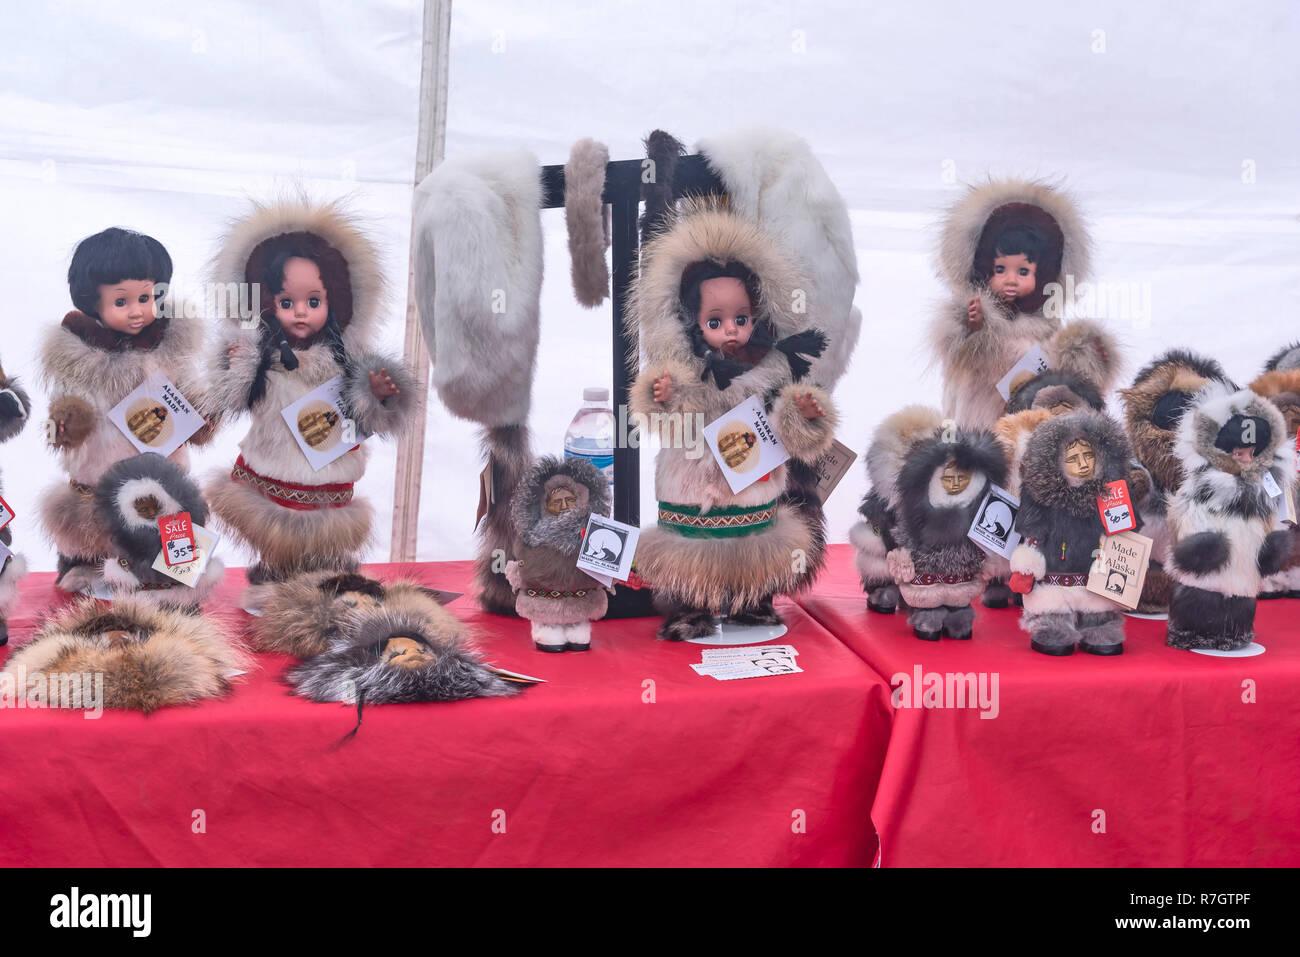 Works of folk art on the shelves of the fair, Anchorage Fair and Festival, Alaska, USA - Stock Image